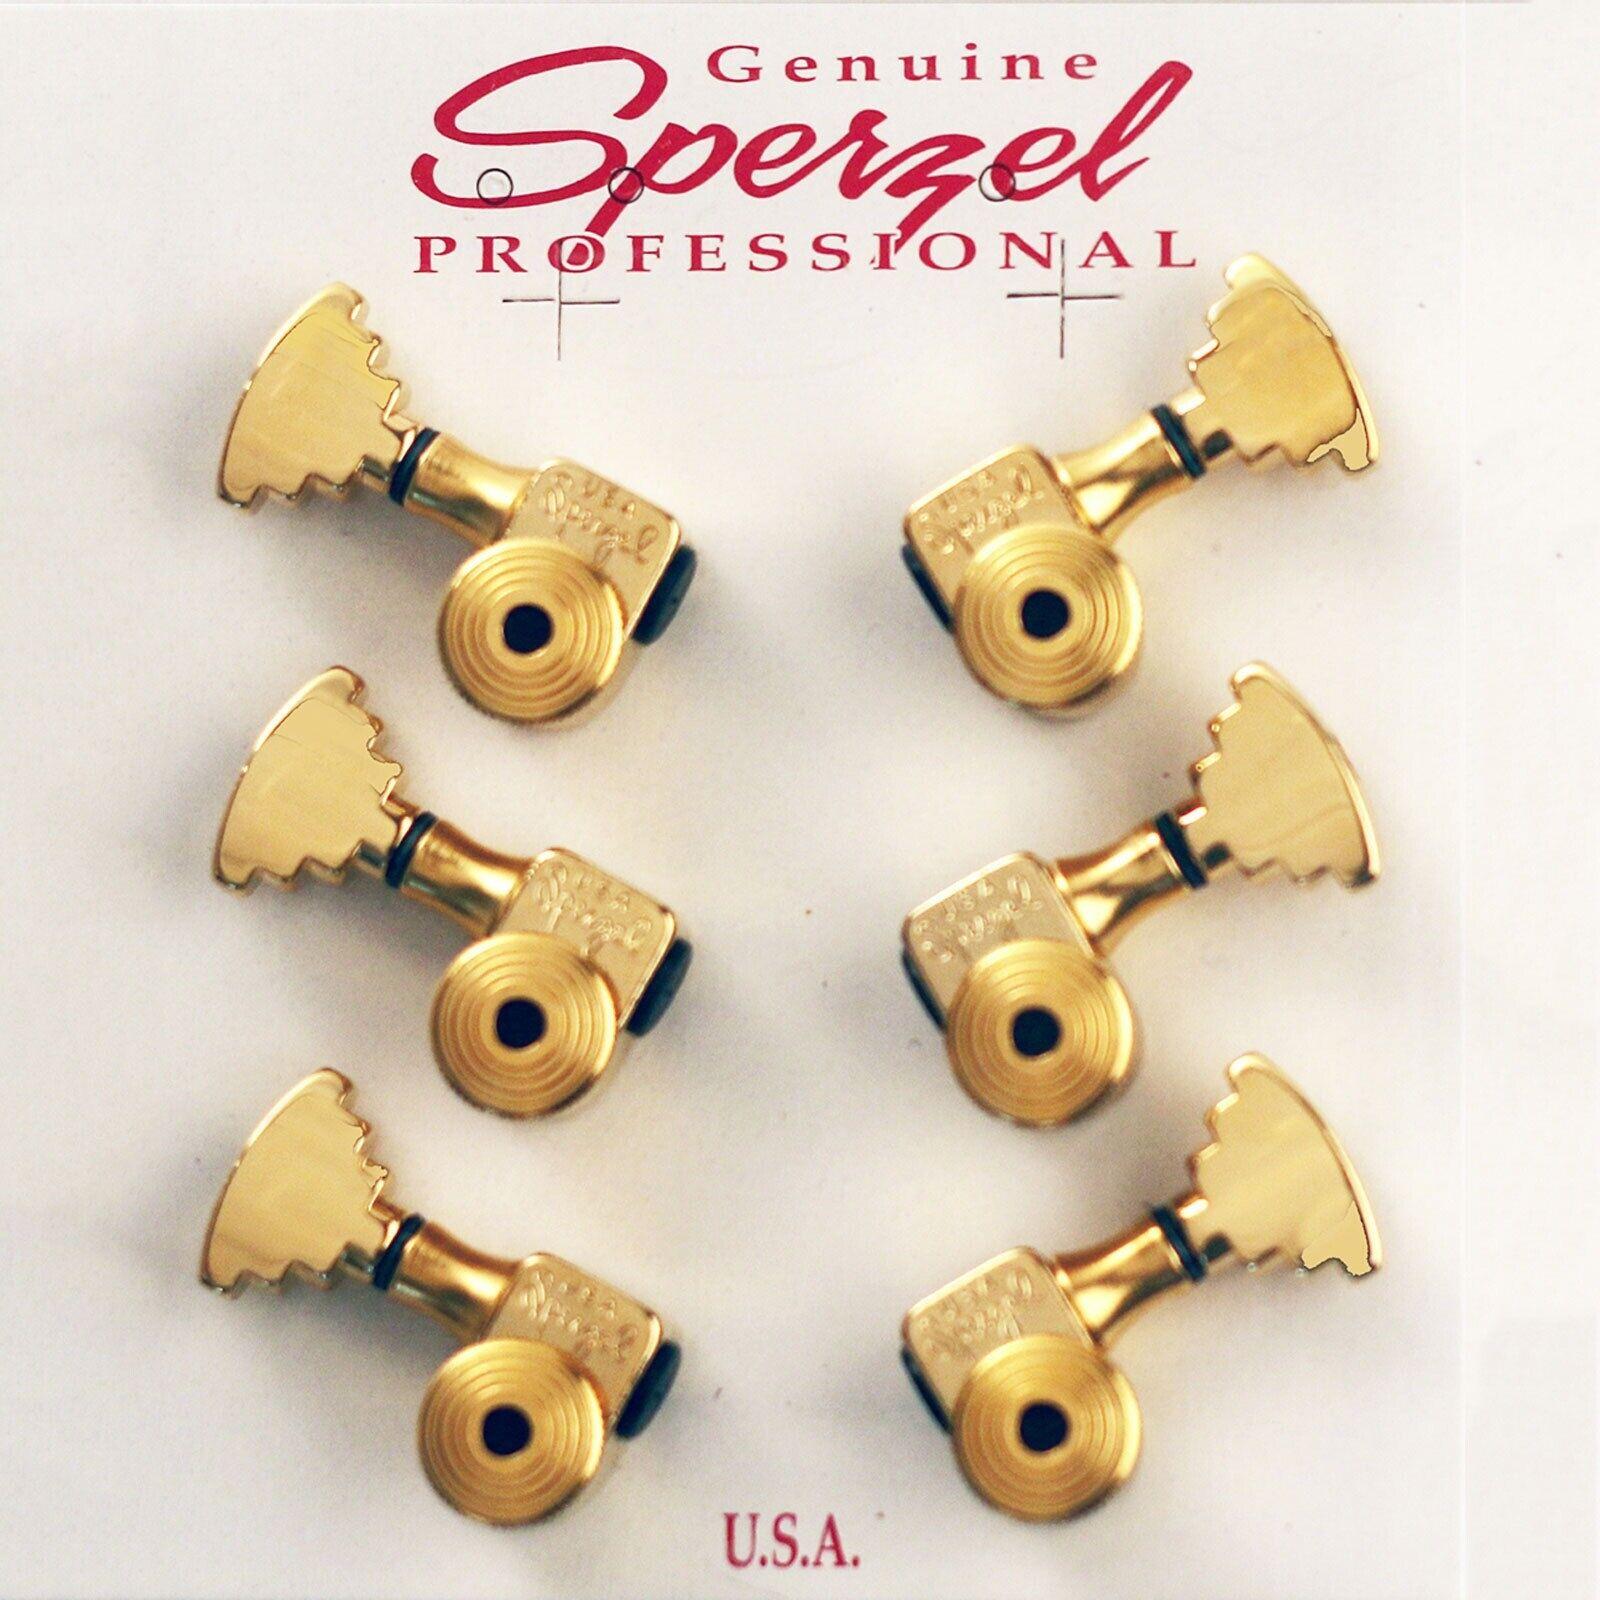 USA Sperzel LOCKING TUNERS Trim-Lock PIN w  STEP Butttons SET 3x3 - Gold PLATED